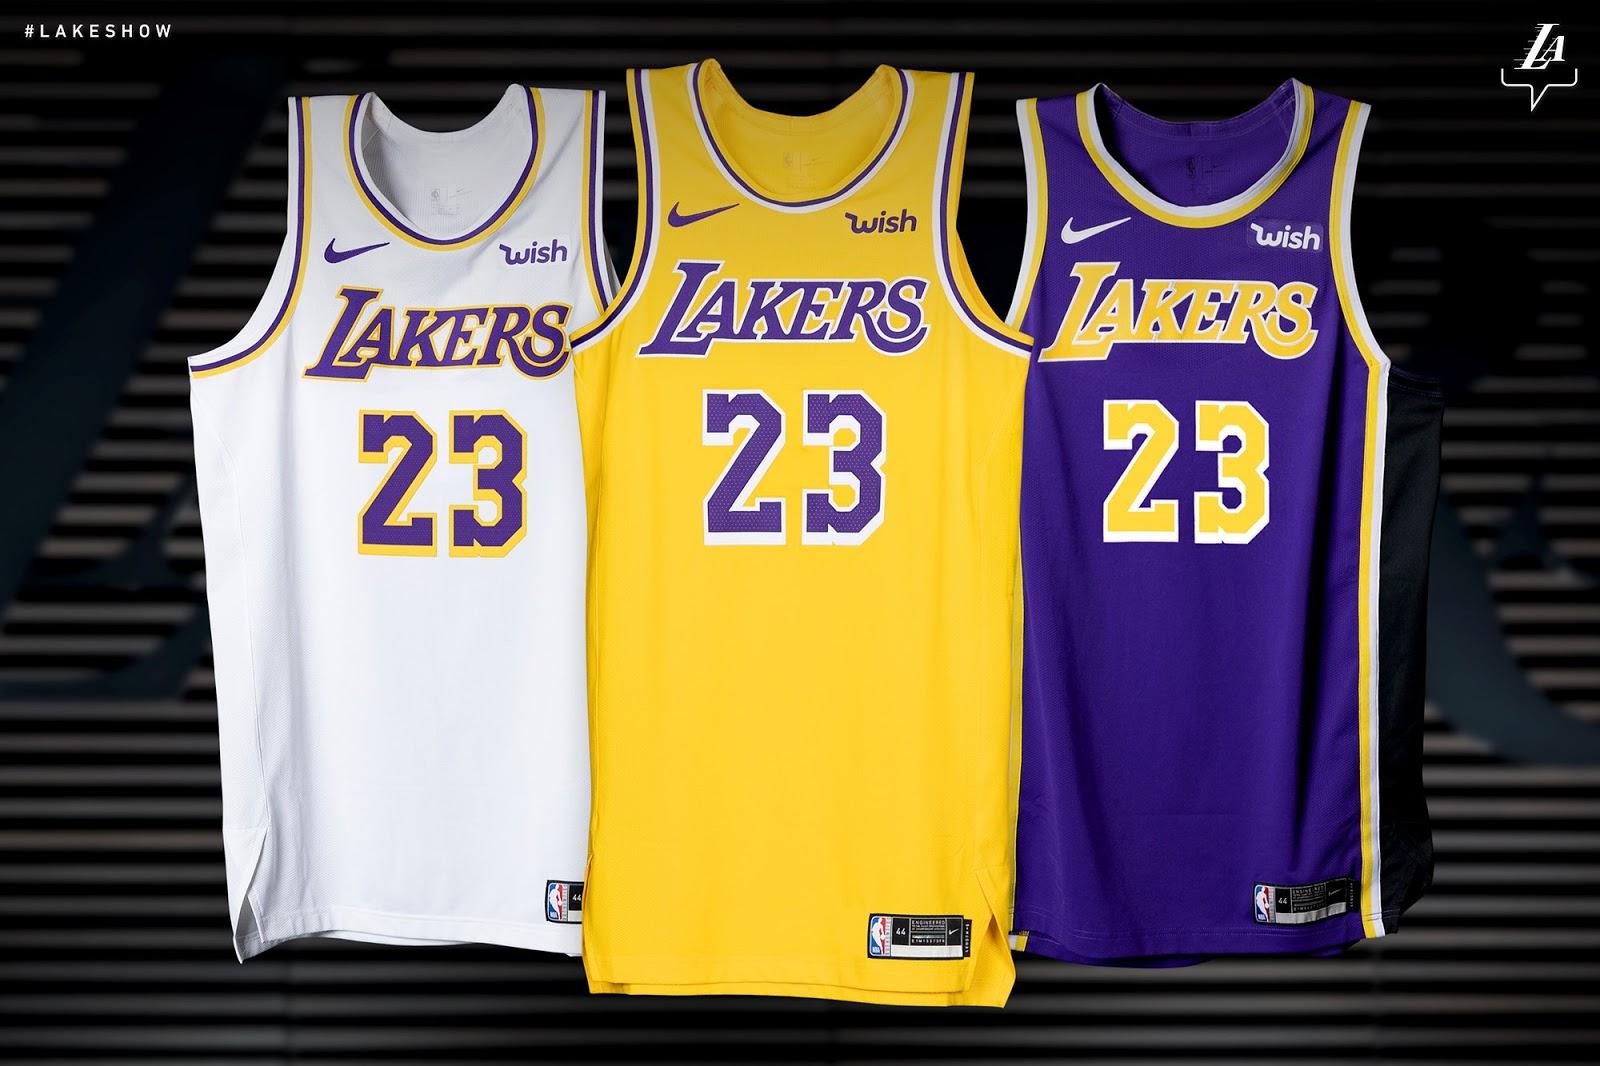 Lakers Wish jersey